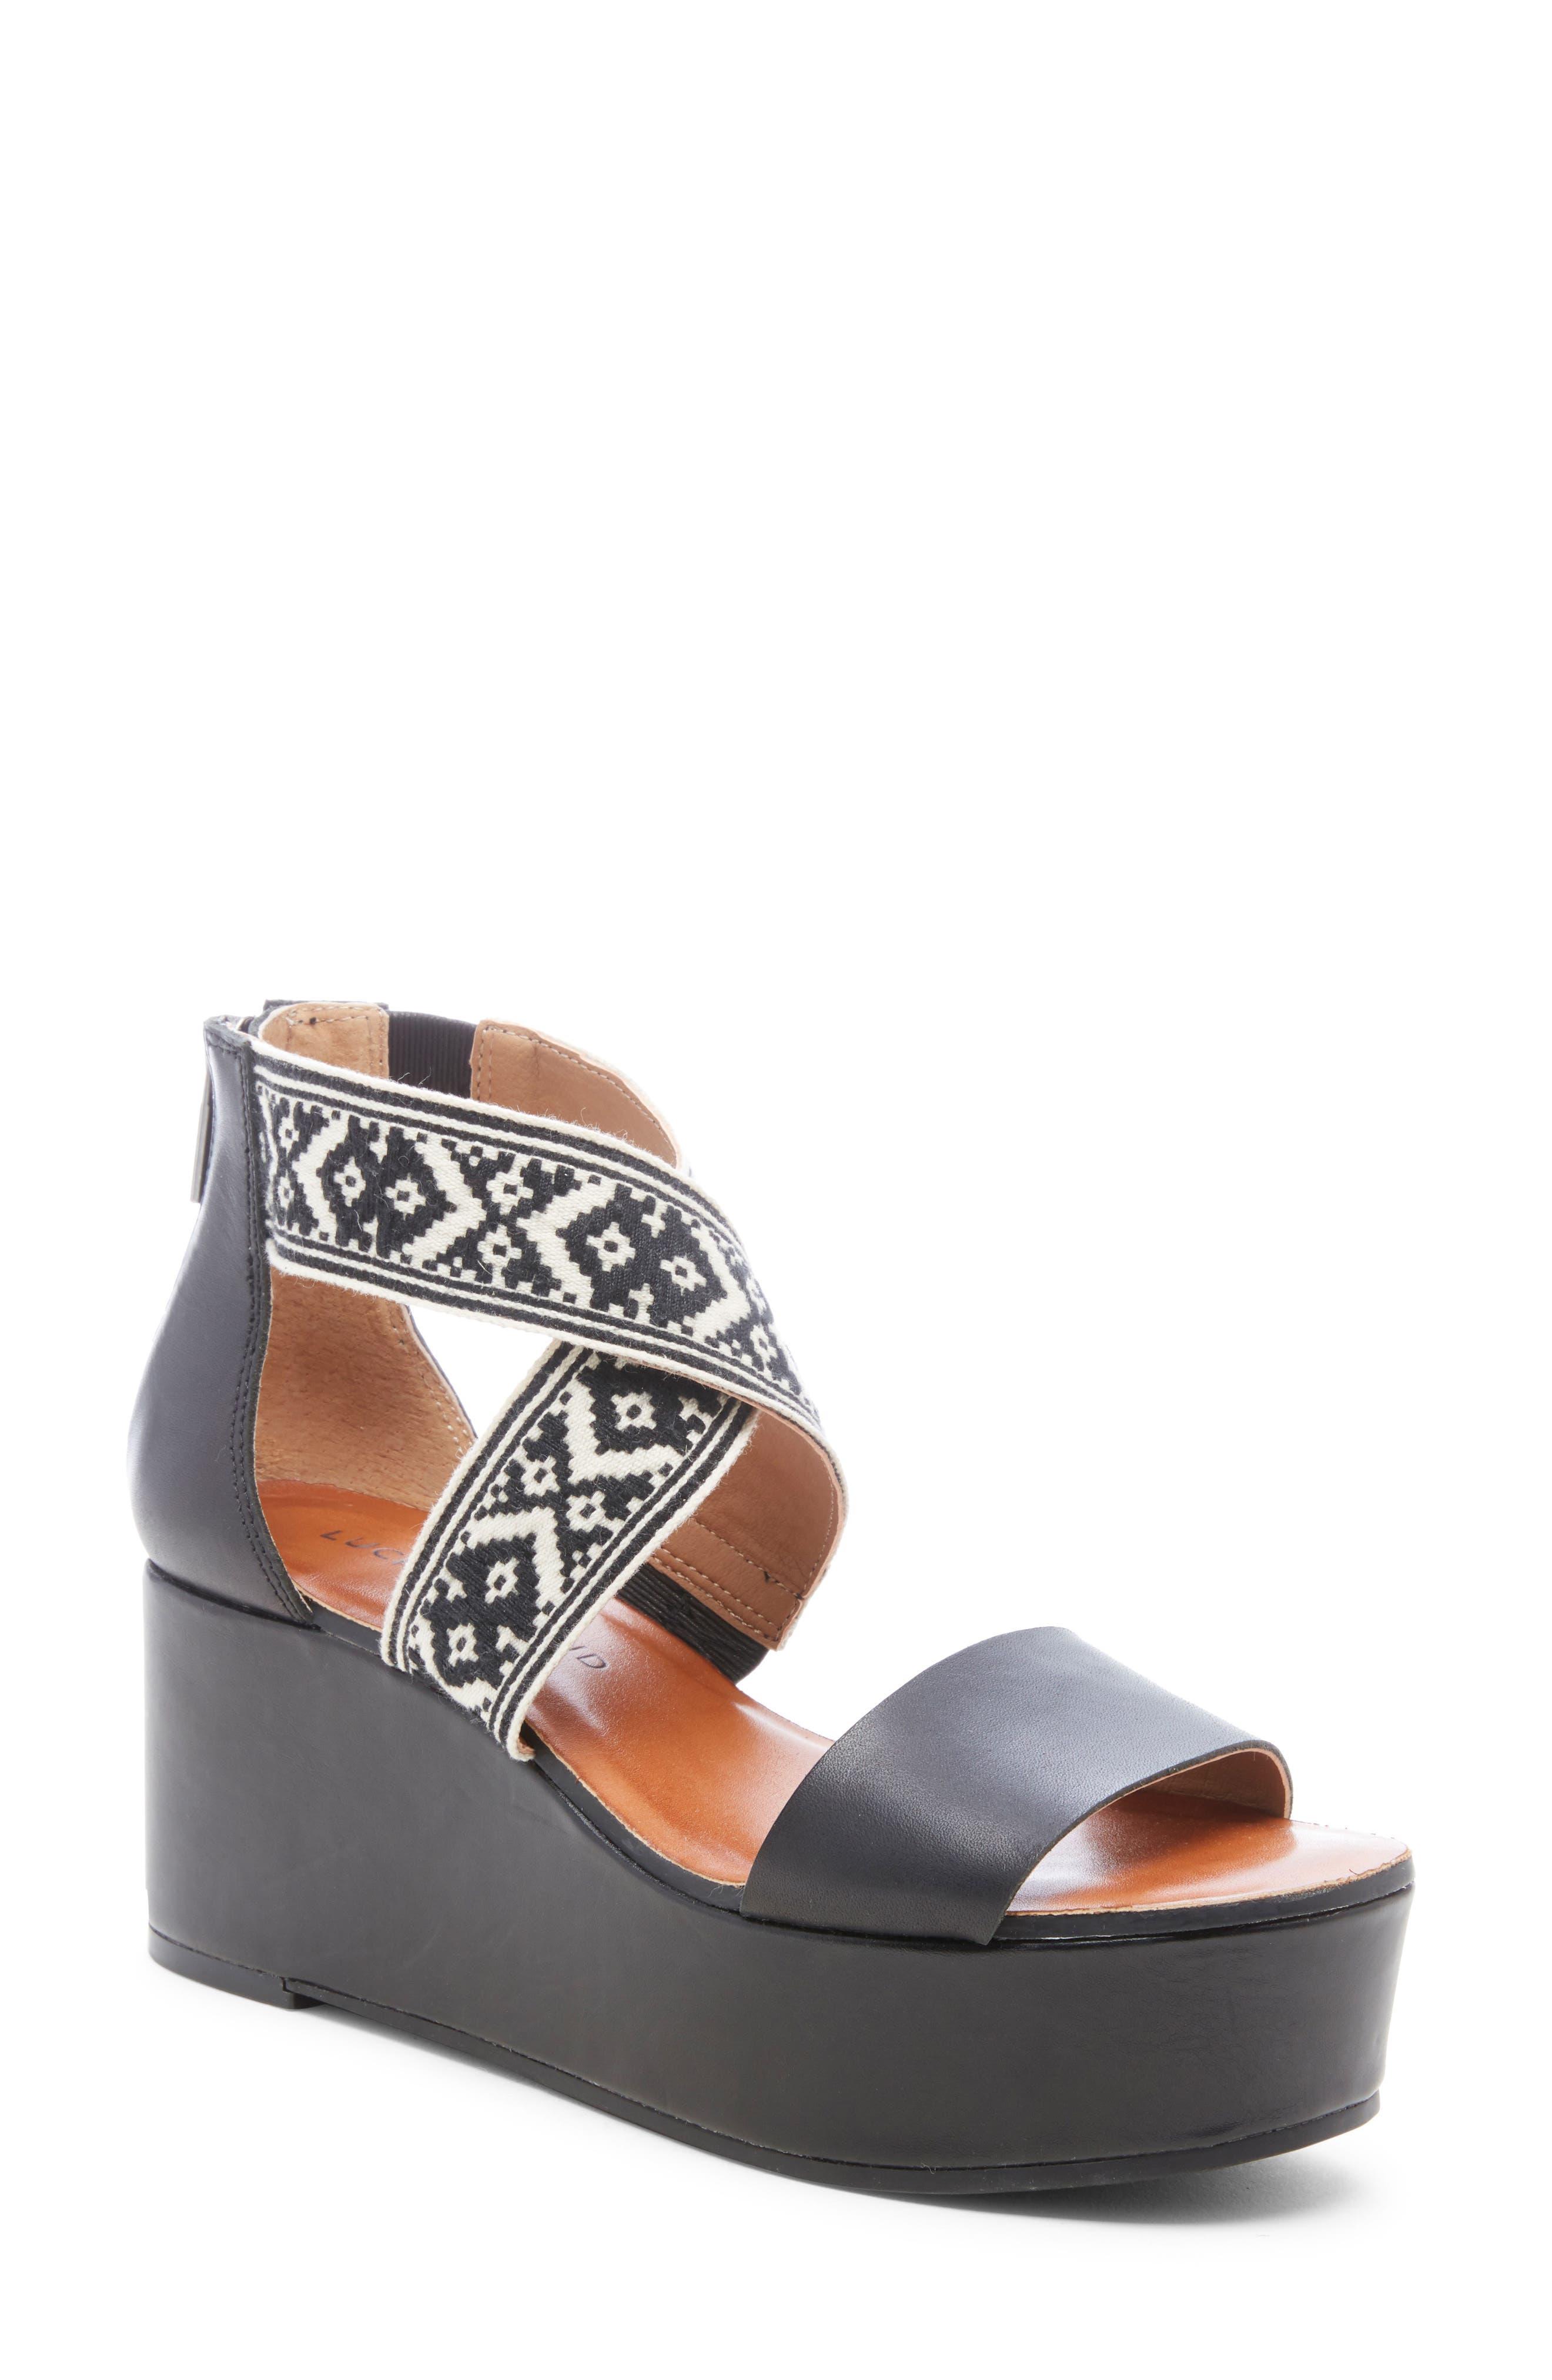 Lucky Brand Gwindolin Platform Wedge Sandal- Black